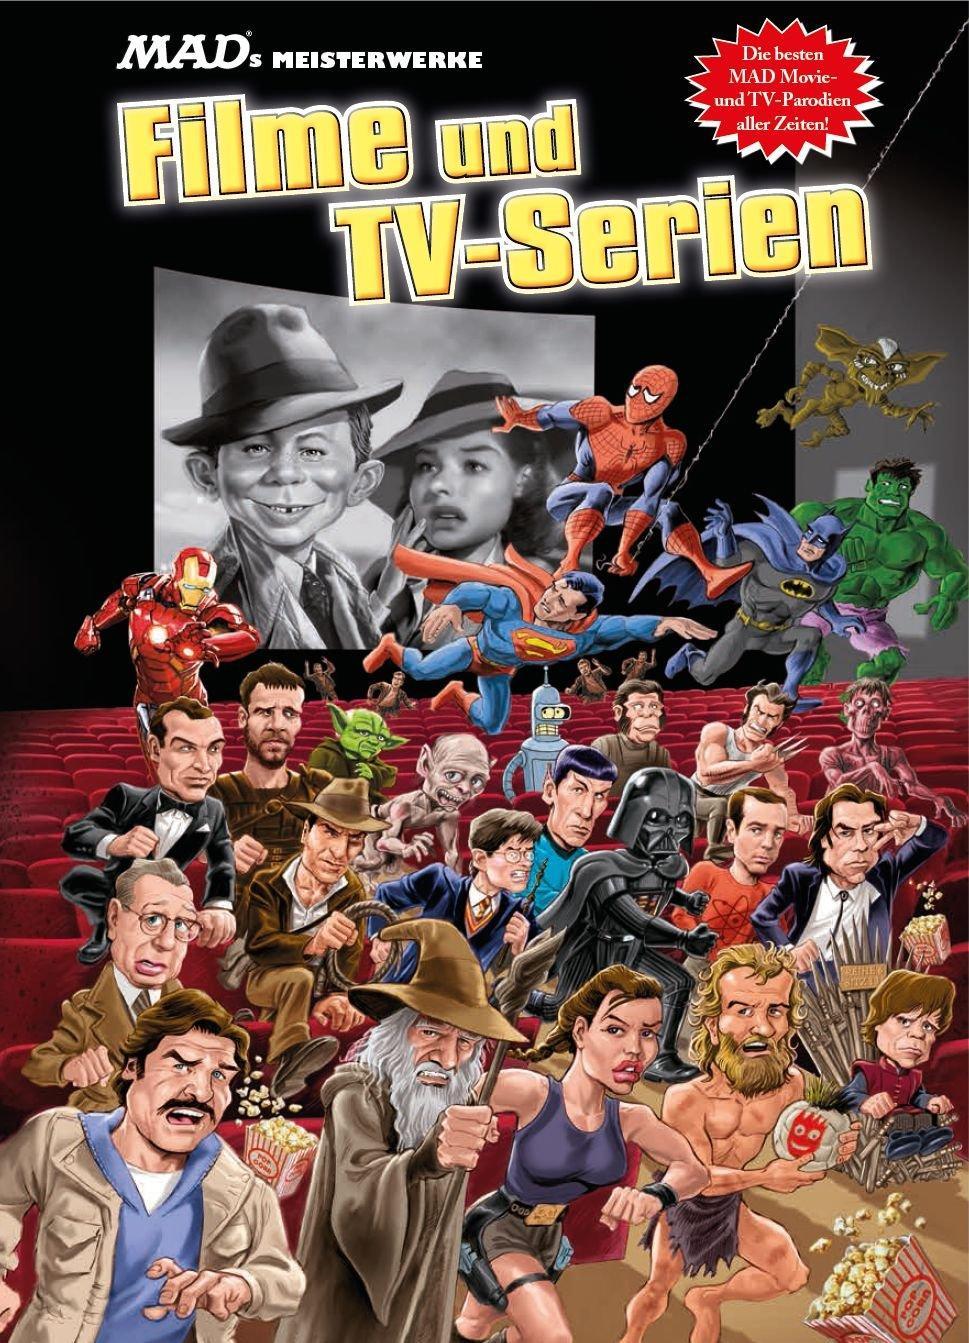 MAD's Meisterwerke: Filme und TV-Serien • Germany • 2nd Edition - Dino/Panini